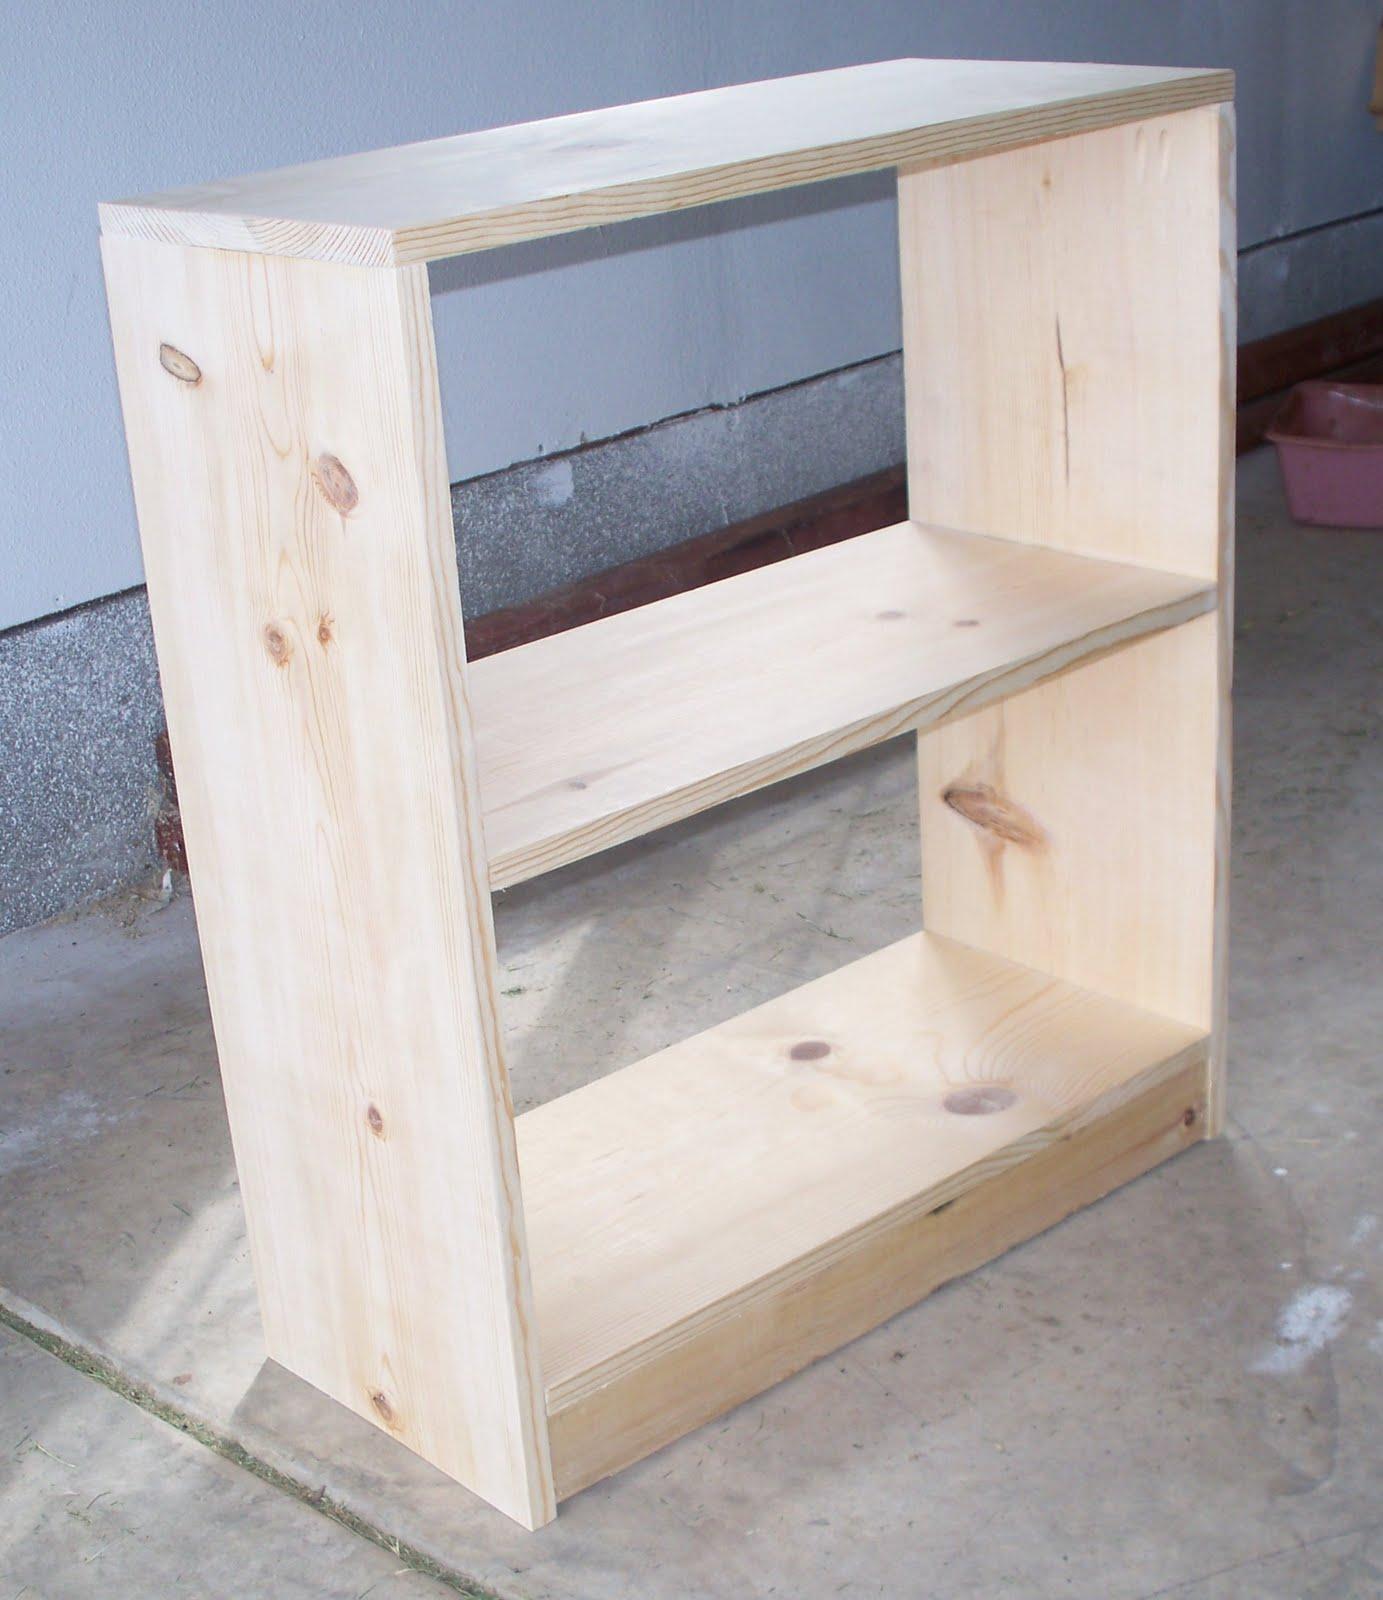 I Built It Myself - Bookshelf - Adventures of a DIY Mom